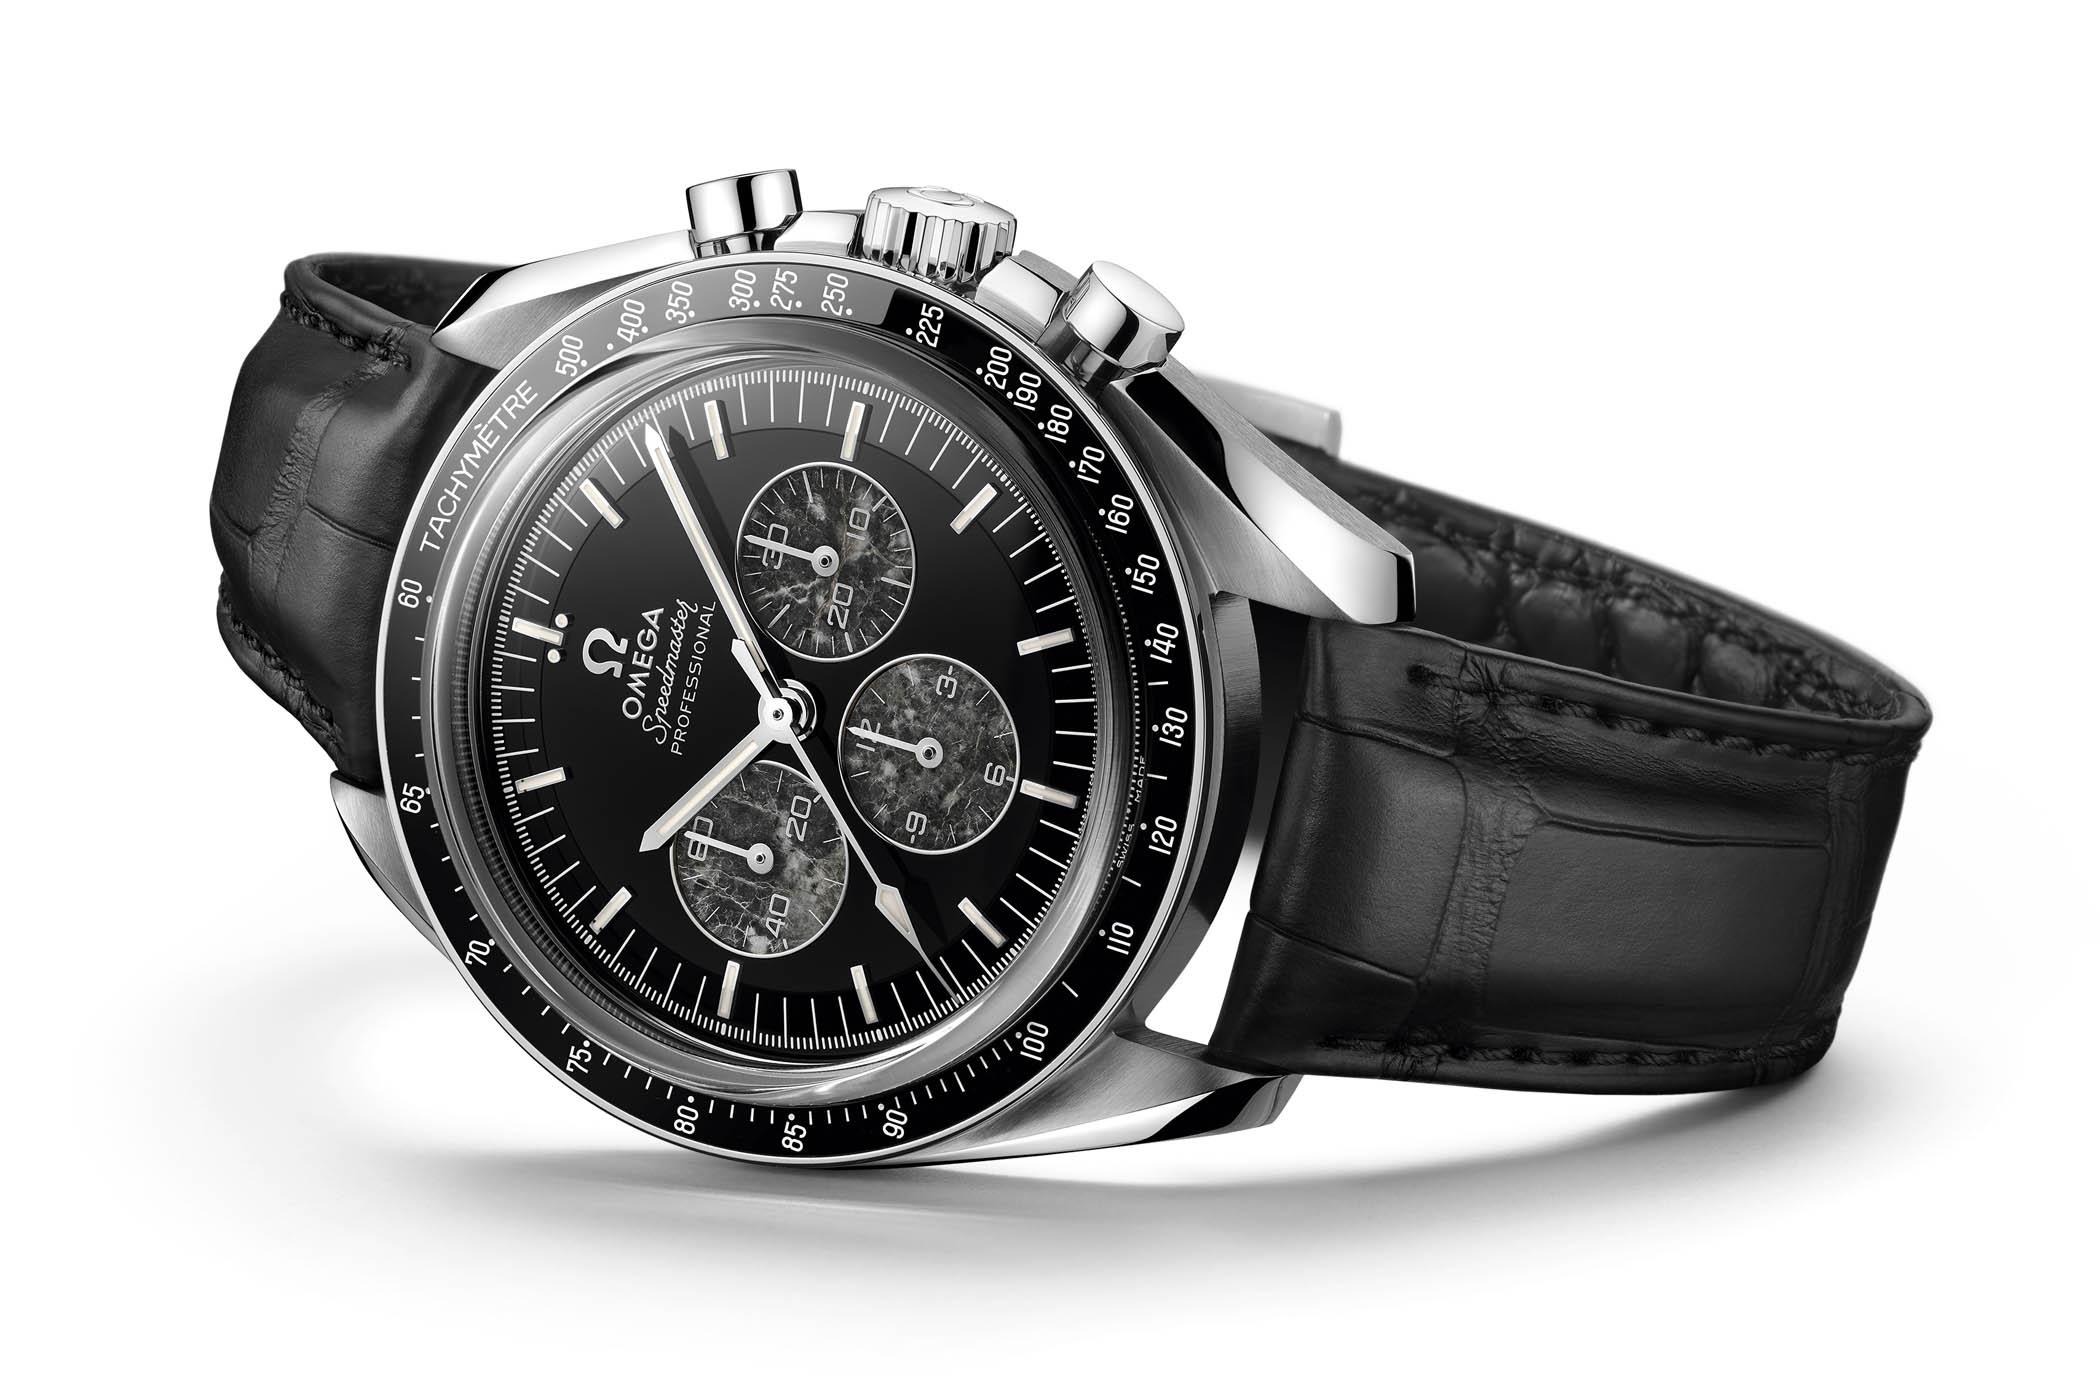 Omega's new Speedmaster Moonwatch 321 Platinum  Omega-Speedmaster-Moonwatch-321-Platinum-311-93-42-30-99-001-Moon-Landing-50-2